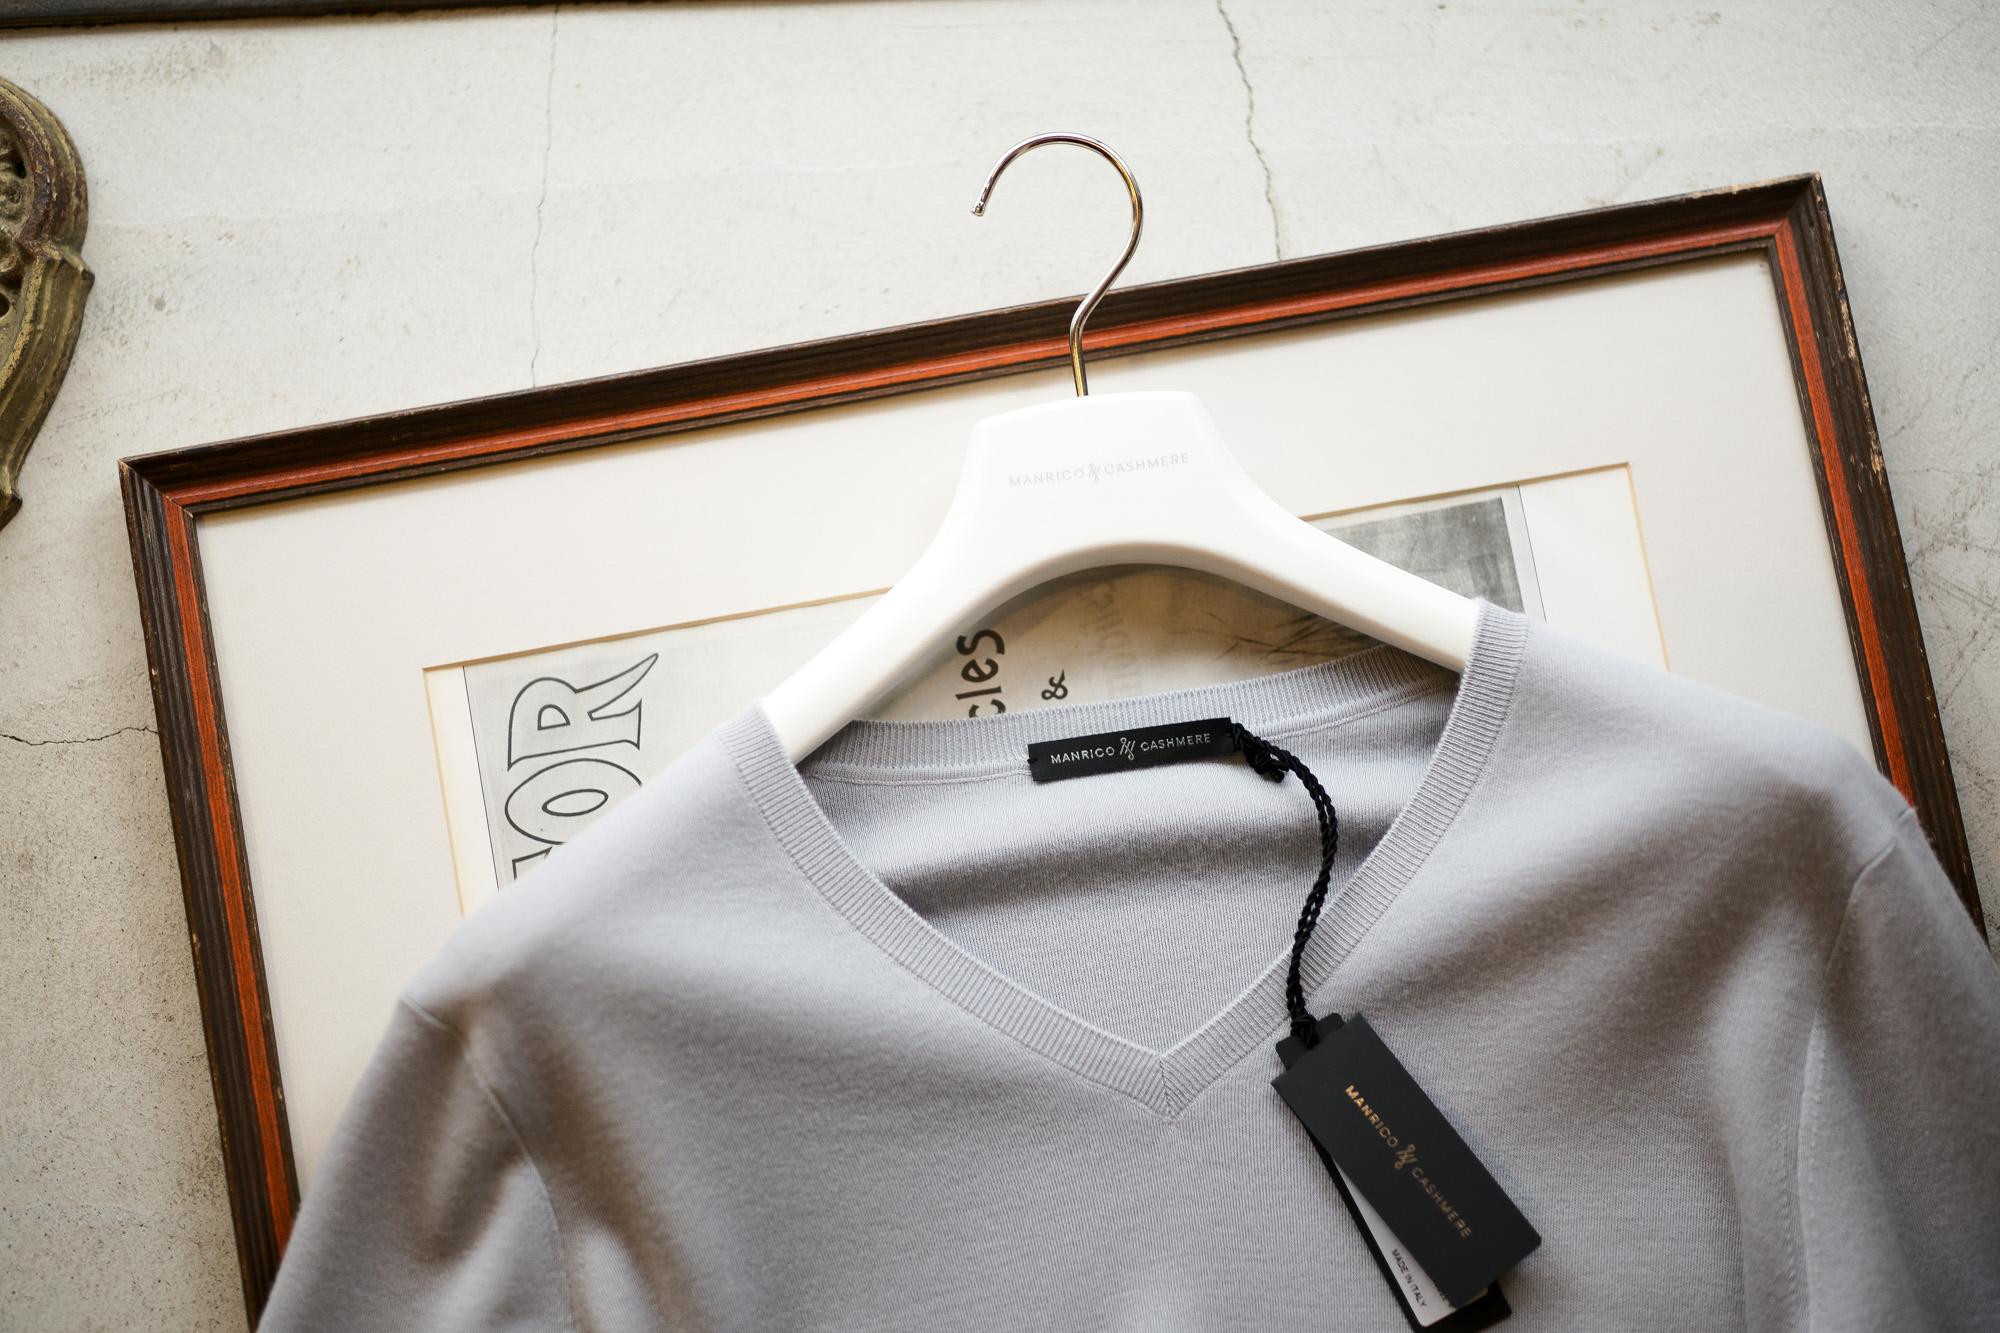 "MANRICO CASHMERE ""Super Cashmere"" V Neck Sweater M040 0001 2020AW マンリコカシミア スーパーカシミア Vネックセーター カシミヤ 愛知 名古屋 altoediritto アルトエデリット"